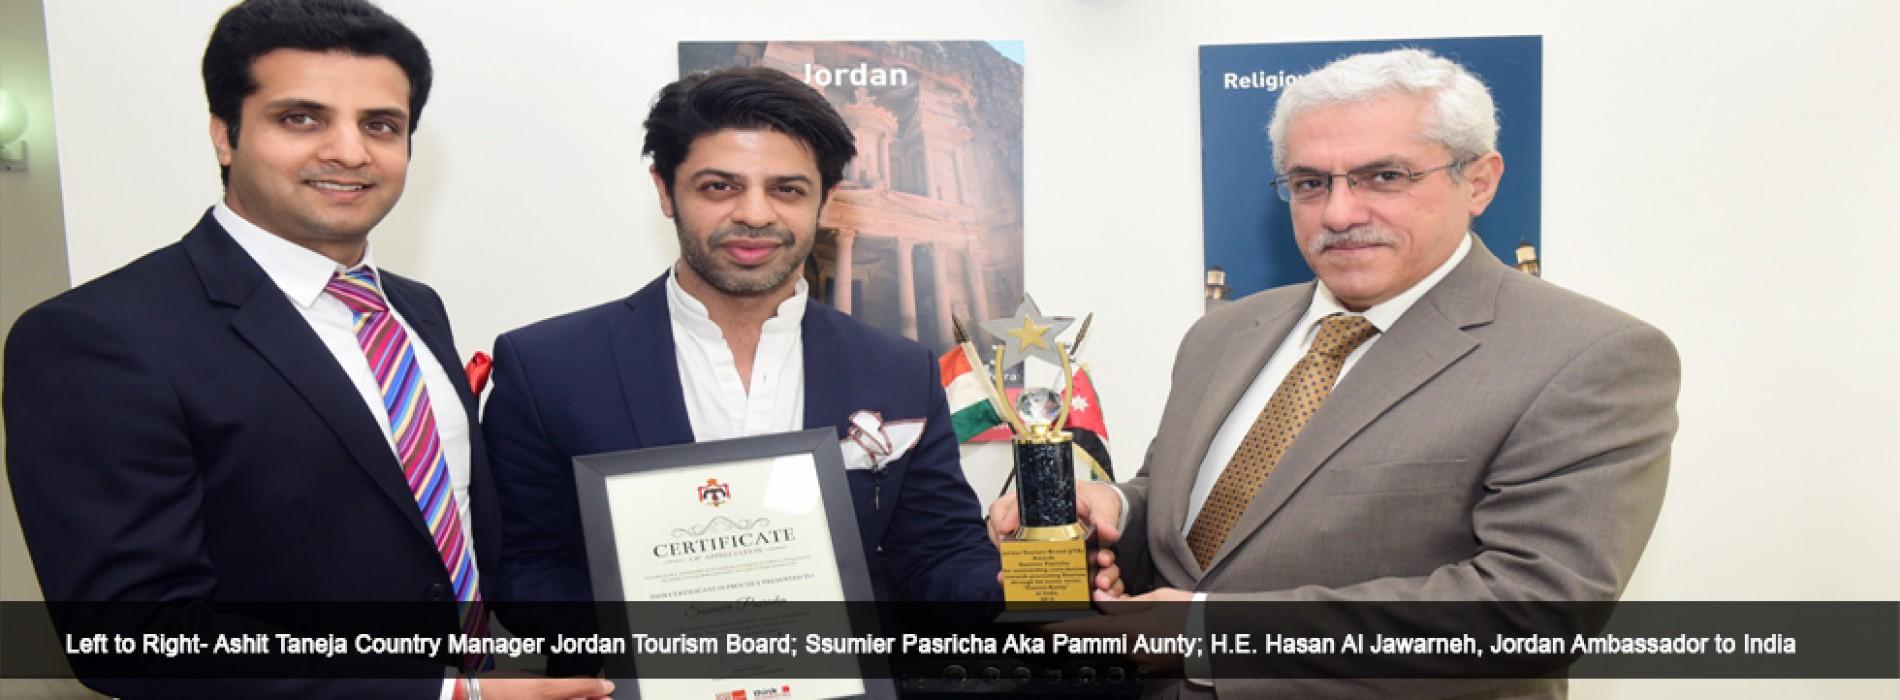 Jordan Tourism Board awards Certificate of Appreciation to Pammi Aunty